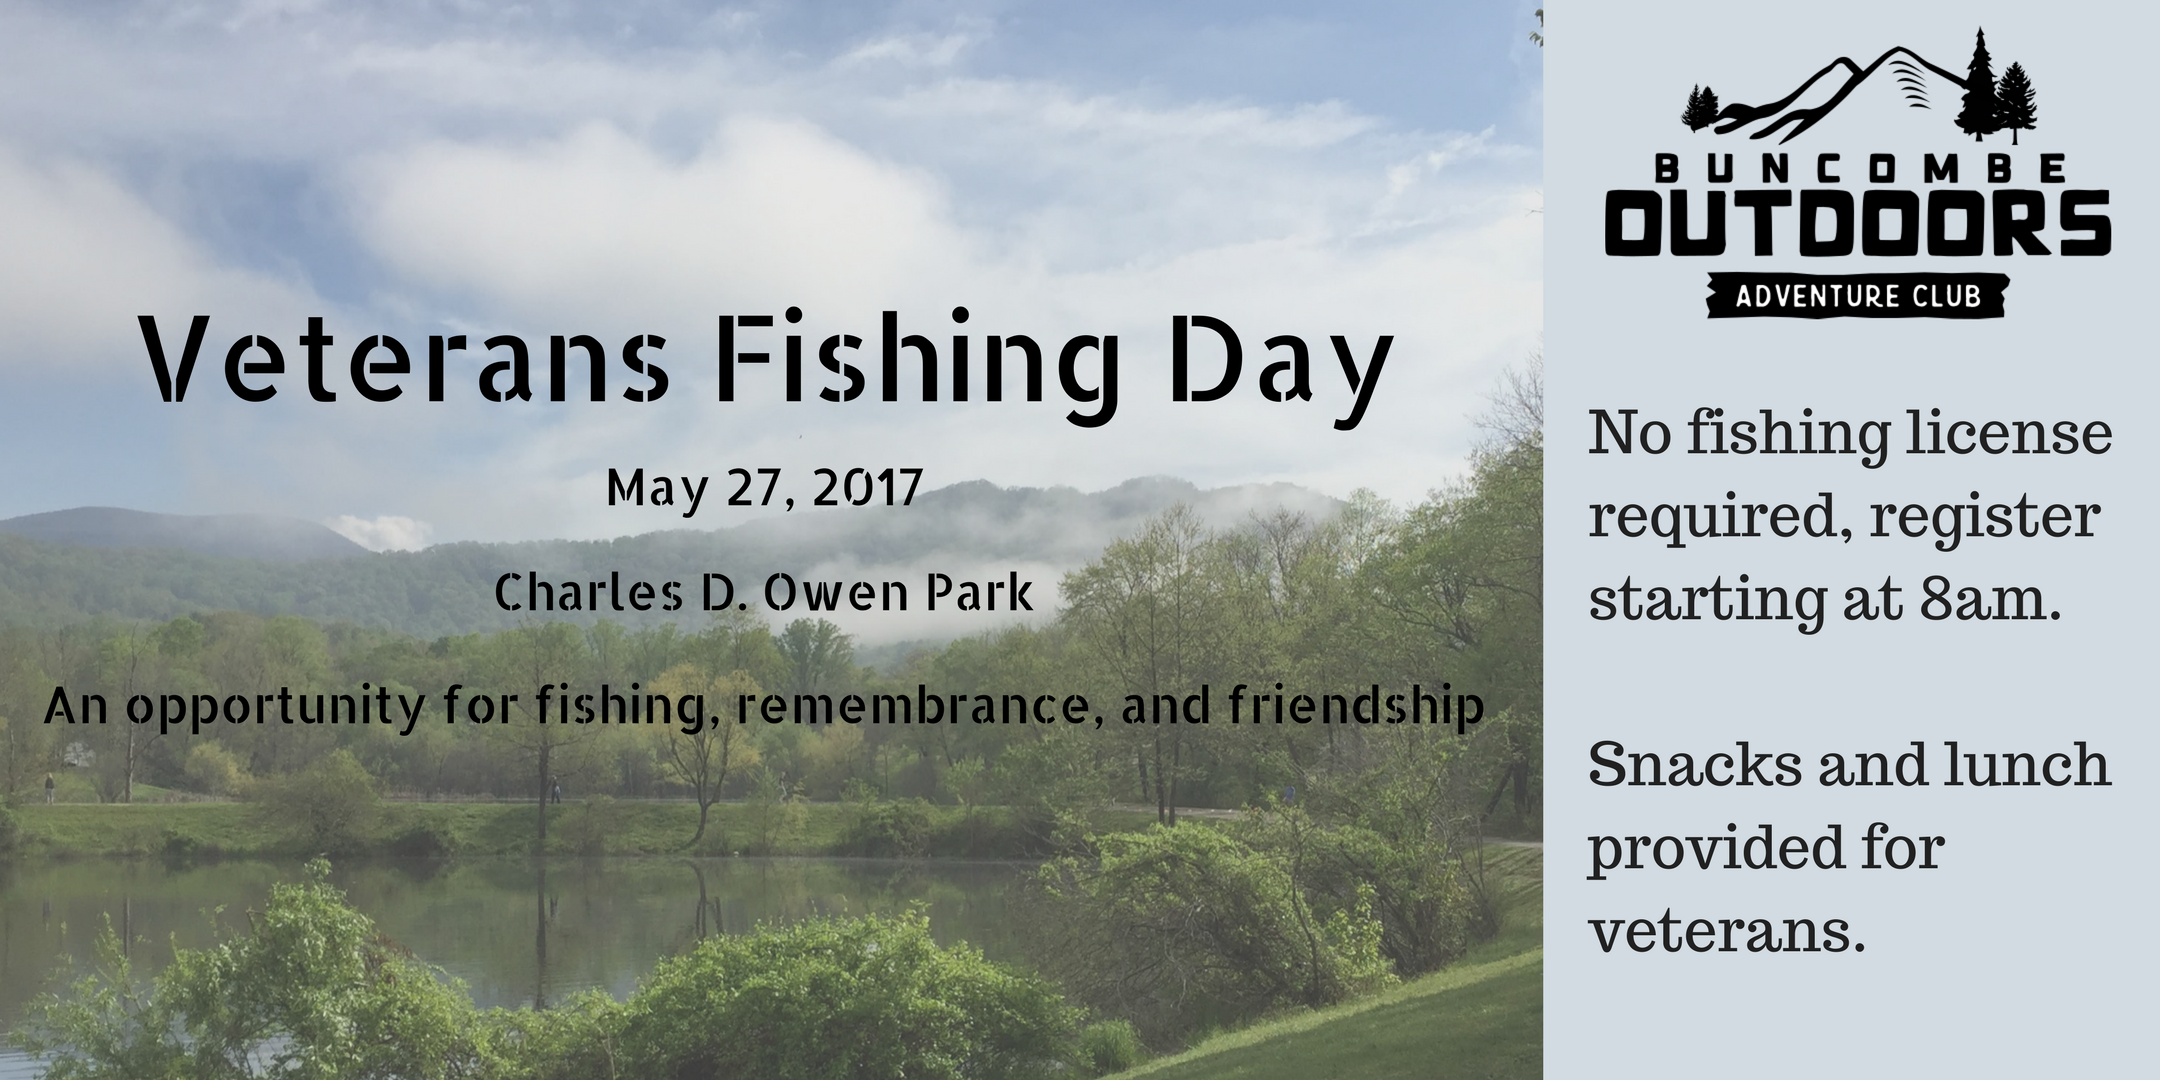 Veterans Fishing Day